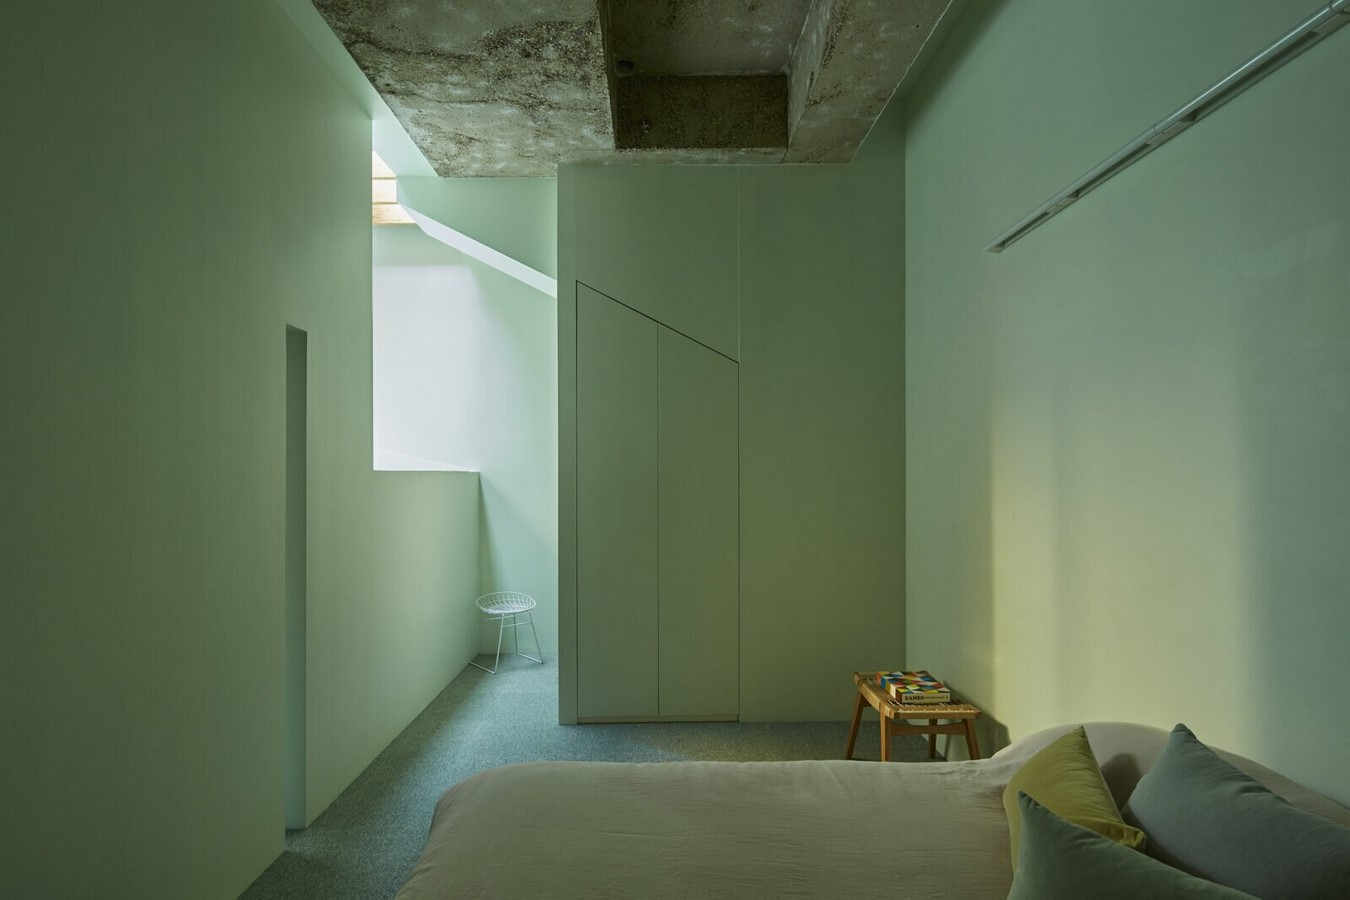 Lost House, London by David Adjaye: A masterpiece foe Spatial Design - Sheet13